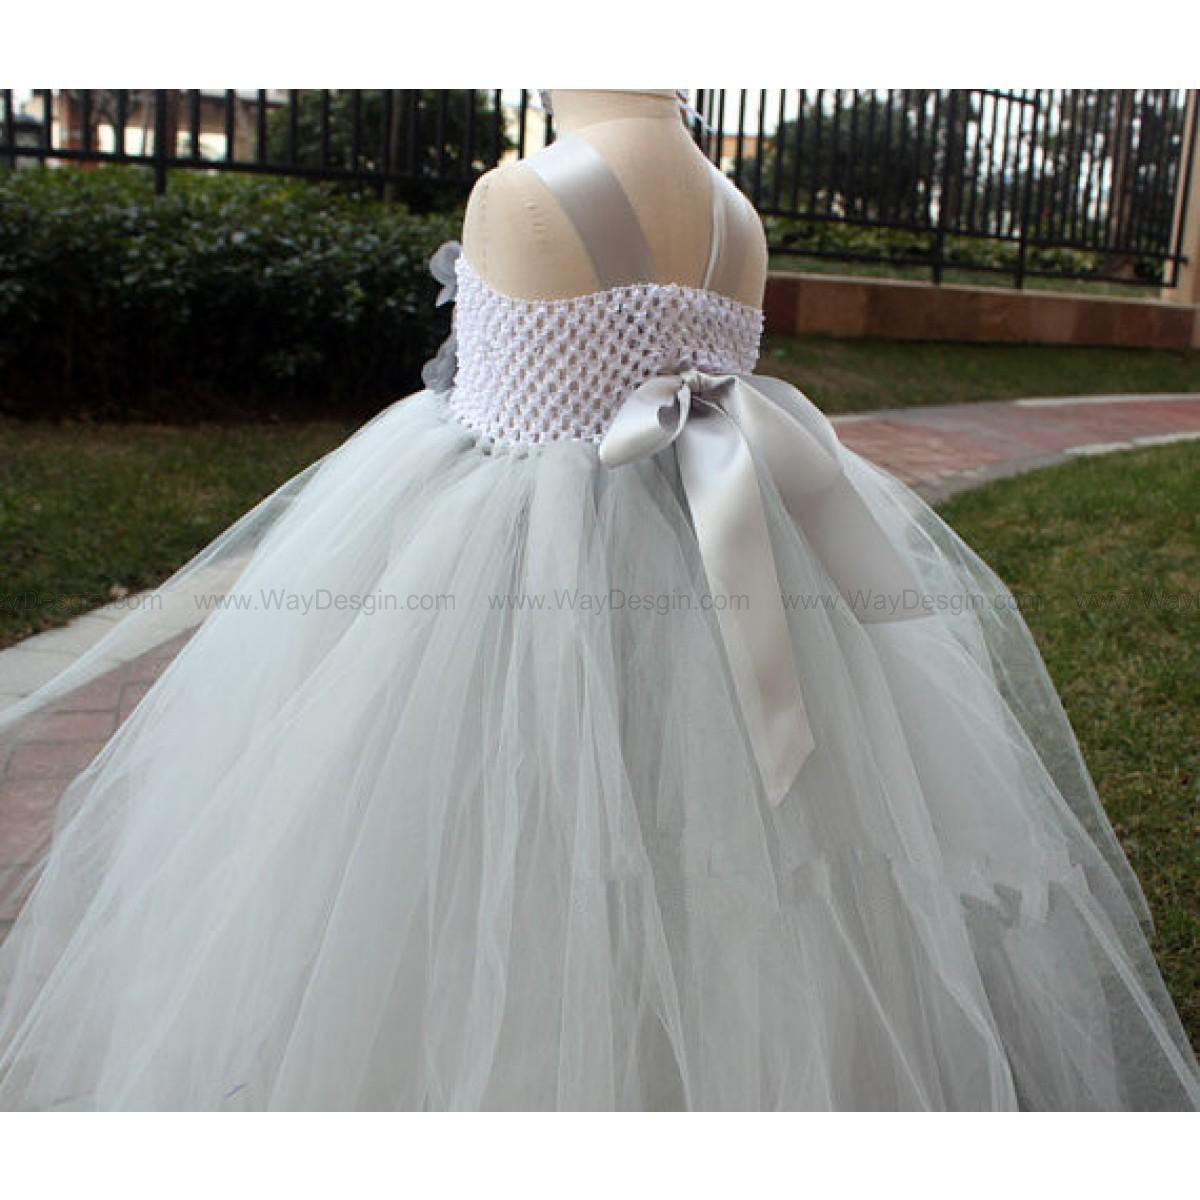 Grey flower girl tutu dress baby dress toddler birthday dress wedding tutu dress with headband